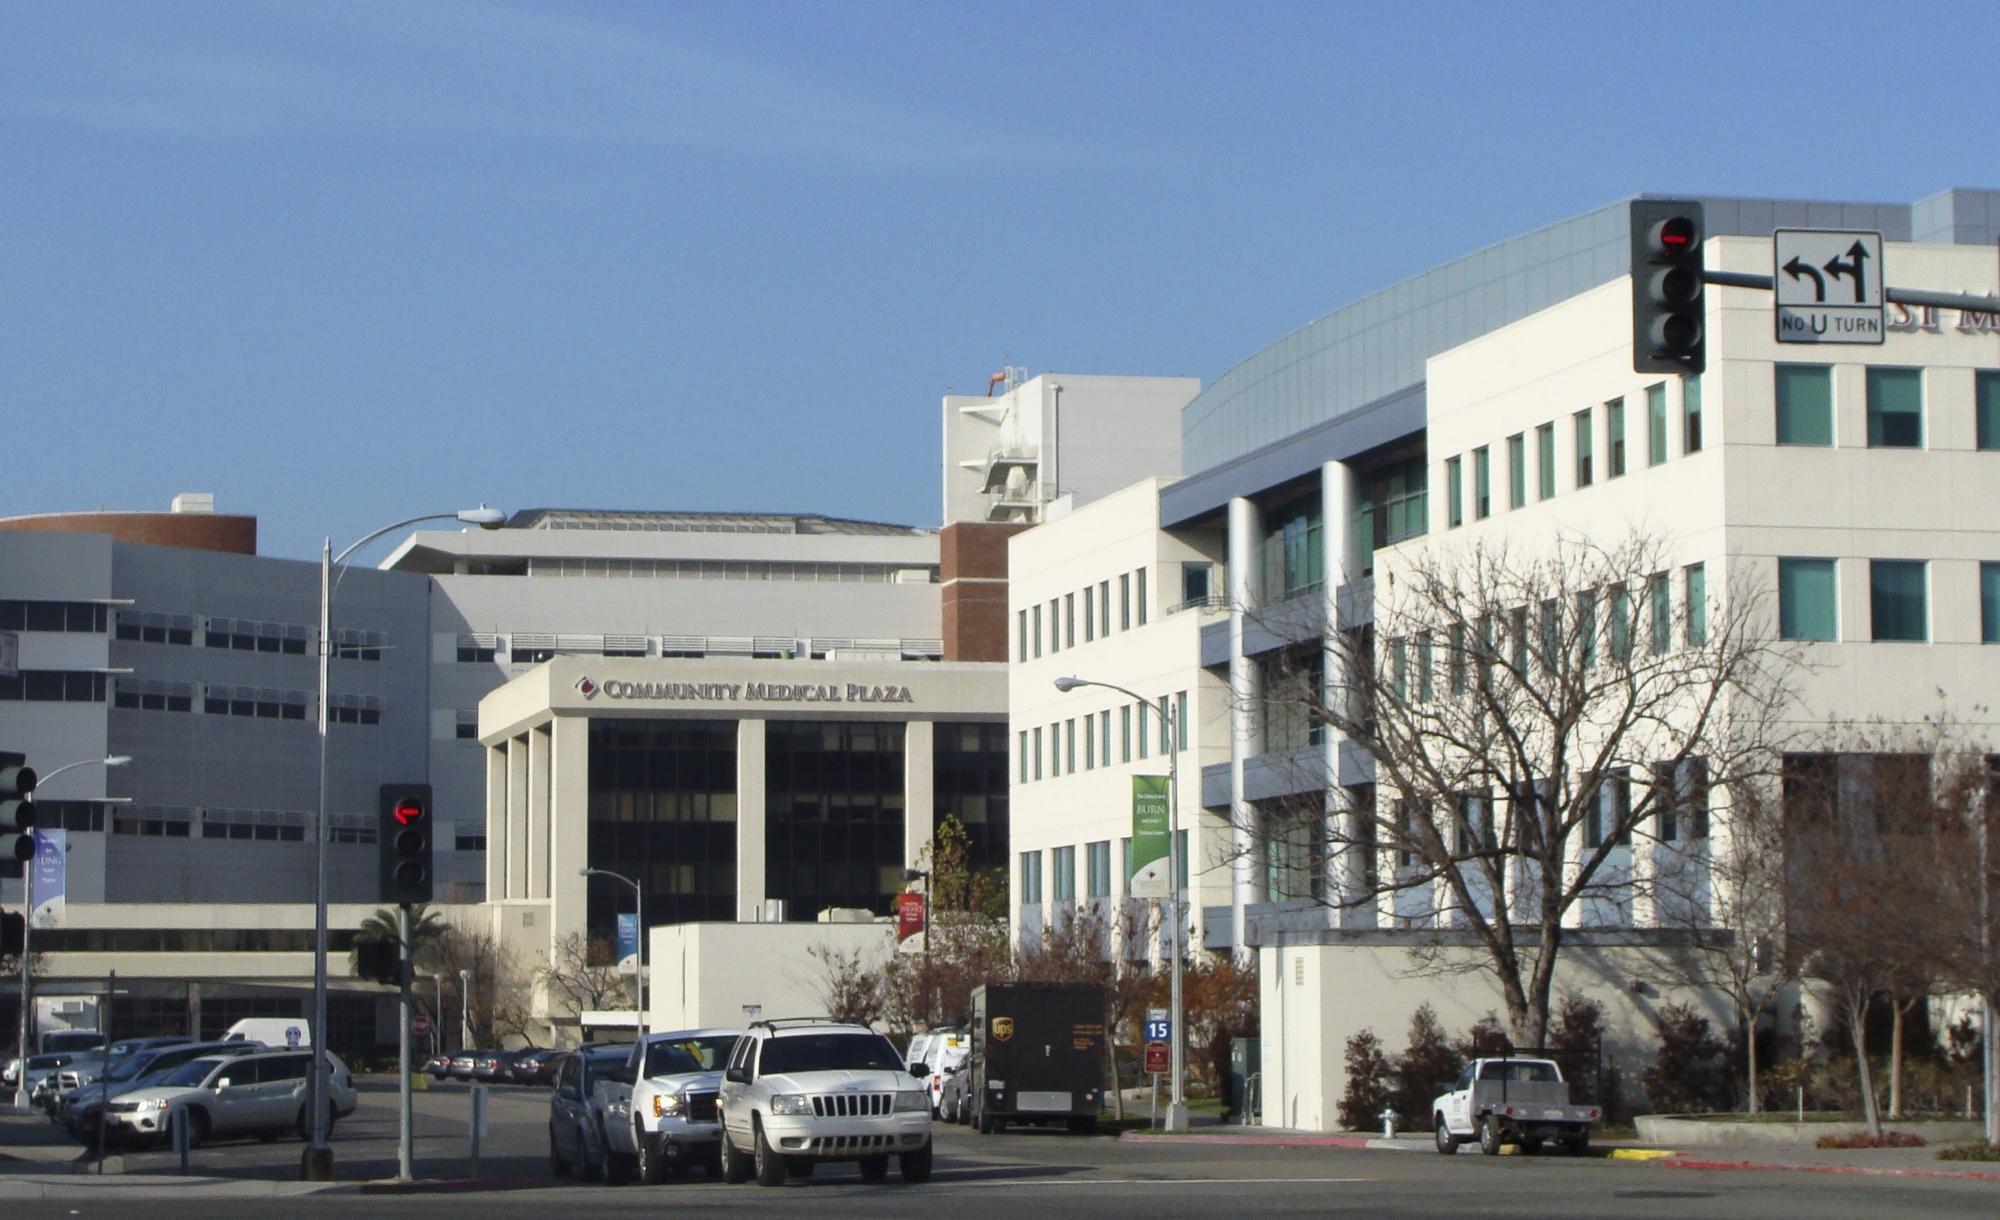 Fresno Community Medical Plaza. Photo by Nima Kasraie via Creative Commons